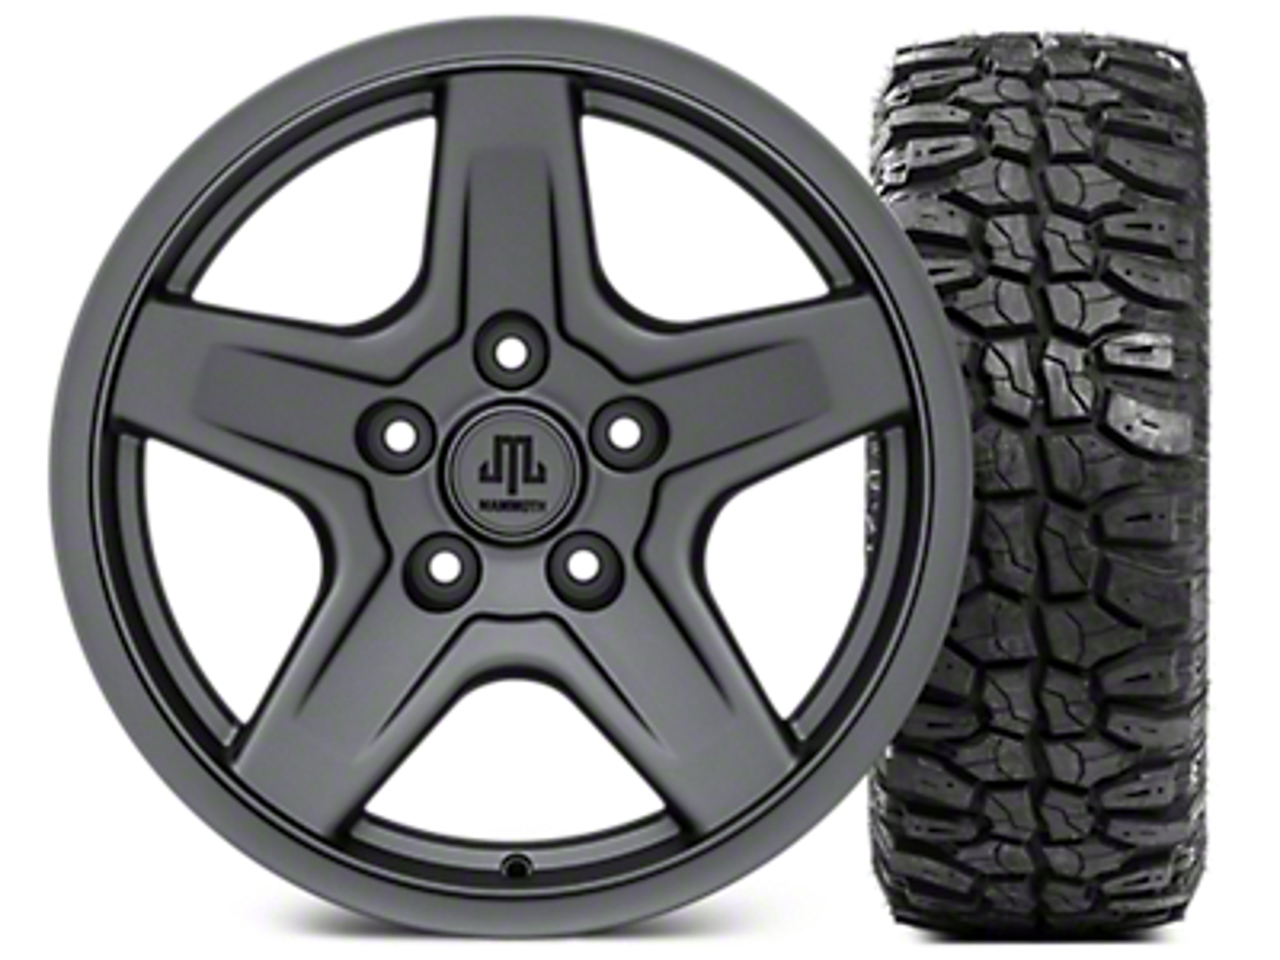 Mammoth Boulder Charcoal Wheel - 17x9 and Mudclaw Radial 35x12.5- 17 (07-18 Jeep Wrangler JK; 2018 Jeep Wrangler JL)